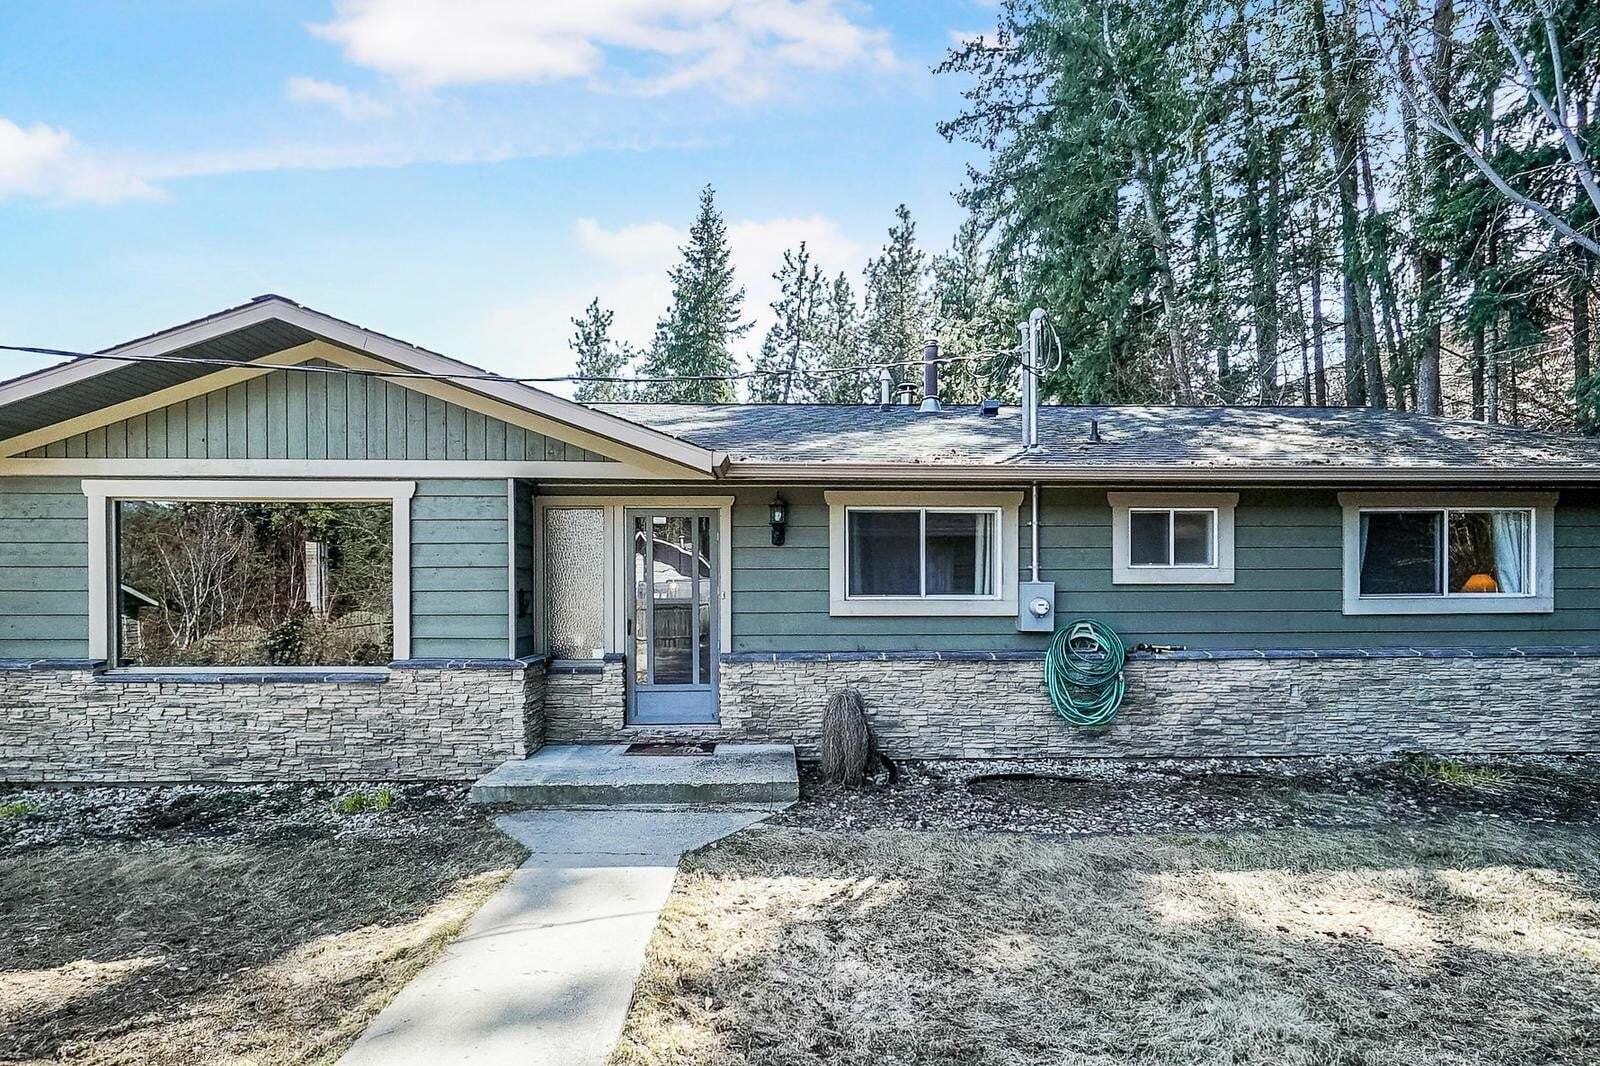 House for sale at 3290 Mcrobbie Rd West Kelowna British Columbia - MLS: 10202457